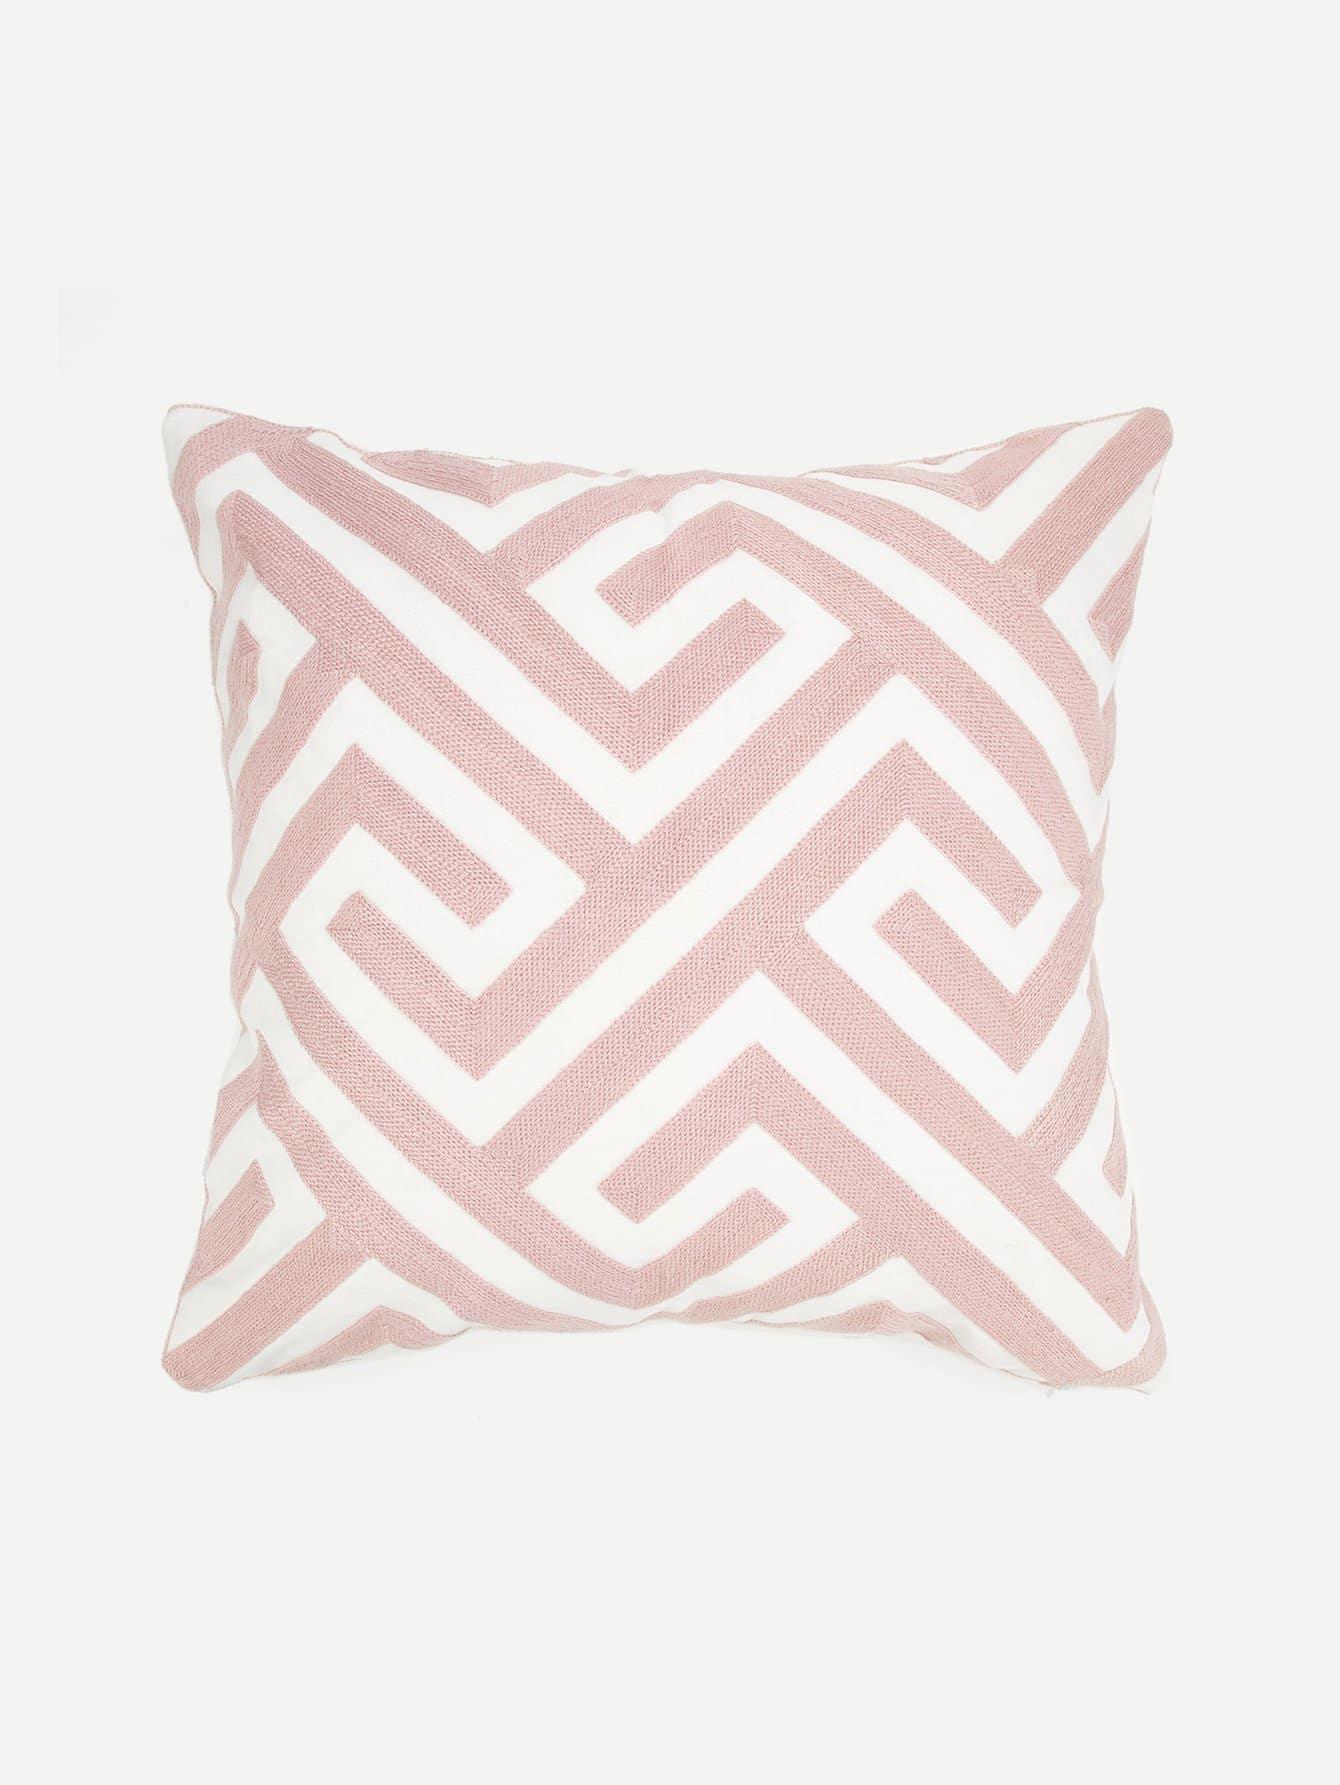 Купить Наволочка для подушка вышивка полоски 1 шт, null, SheIn